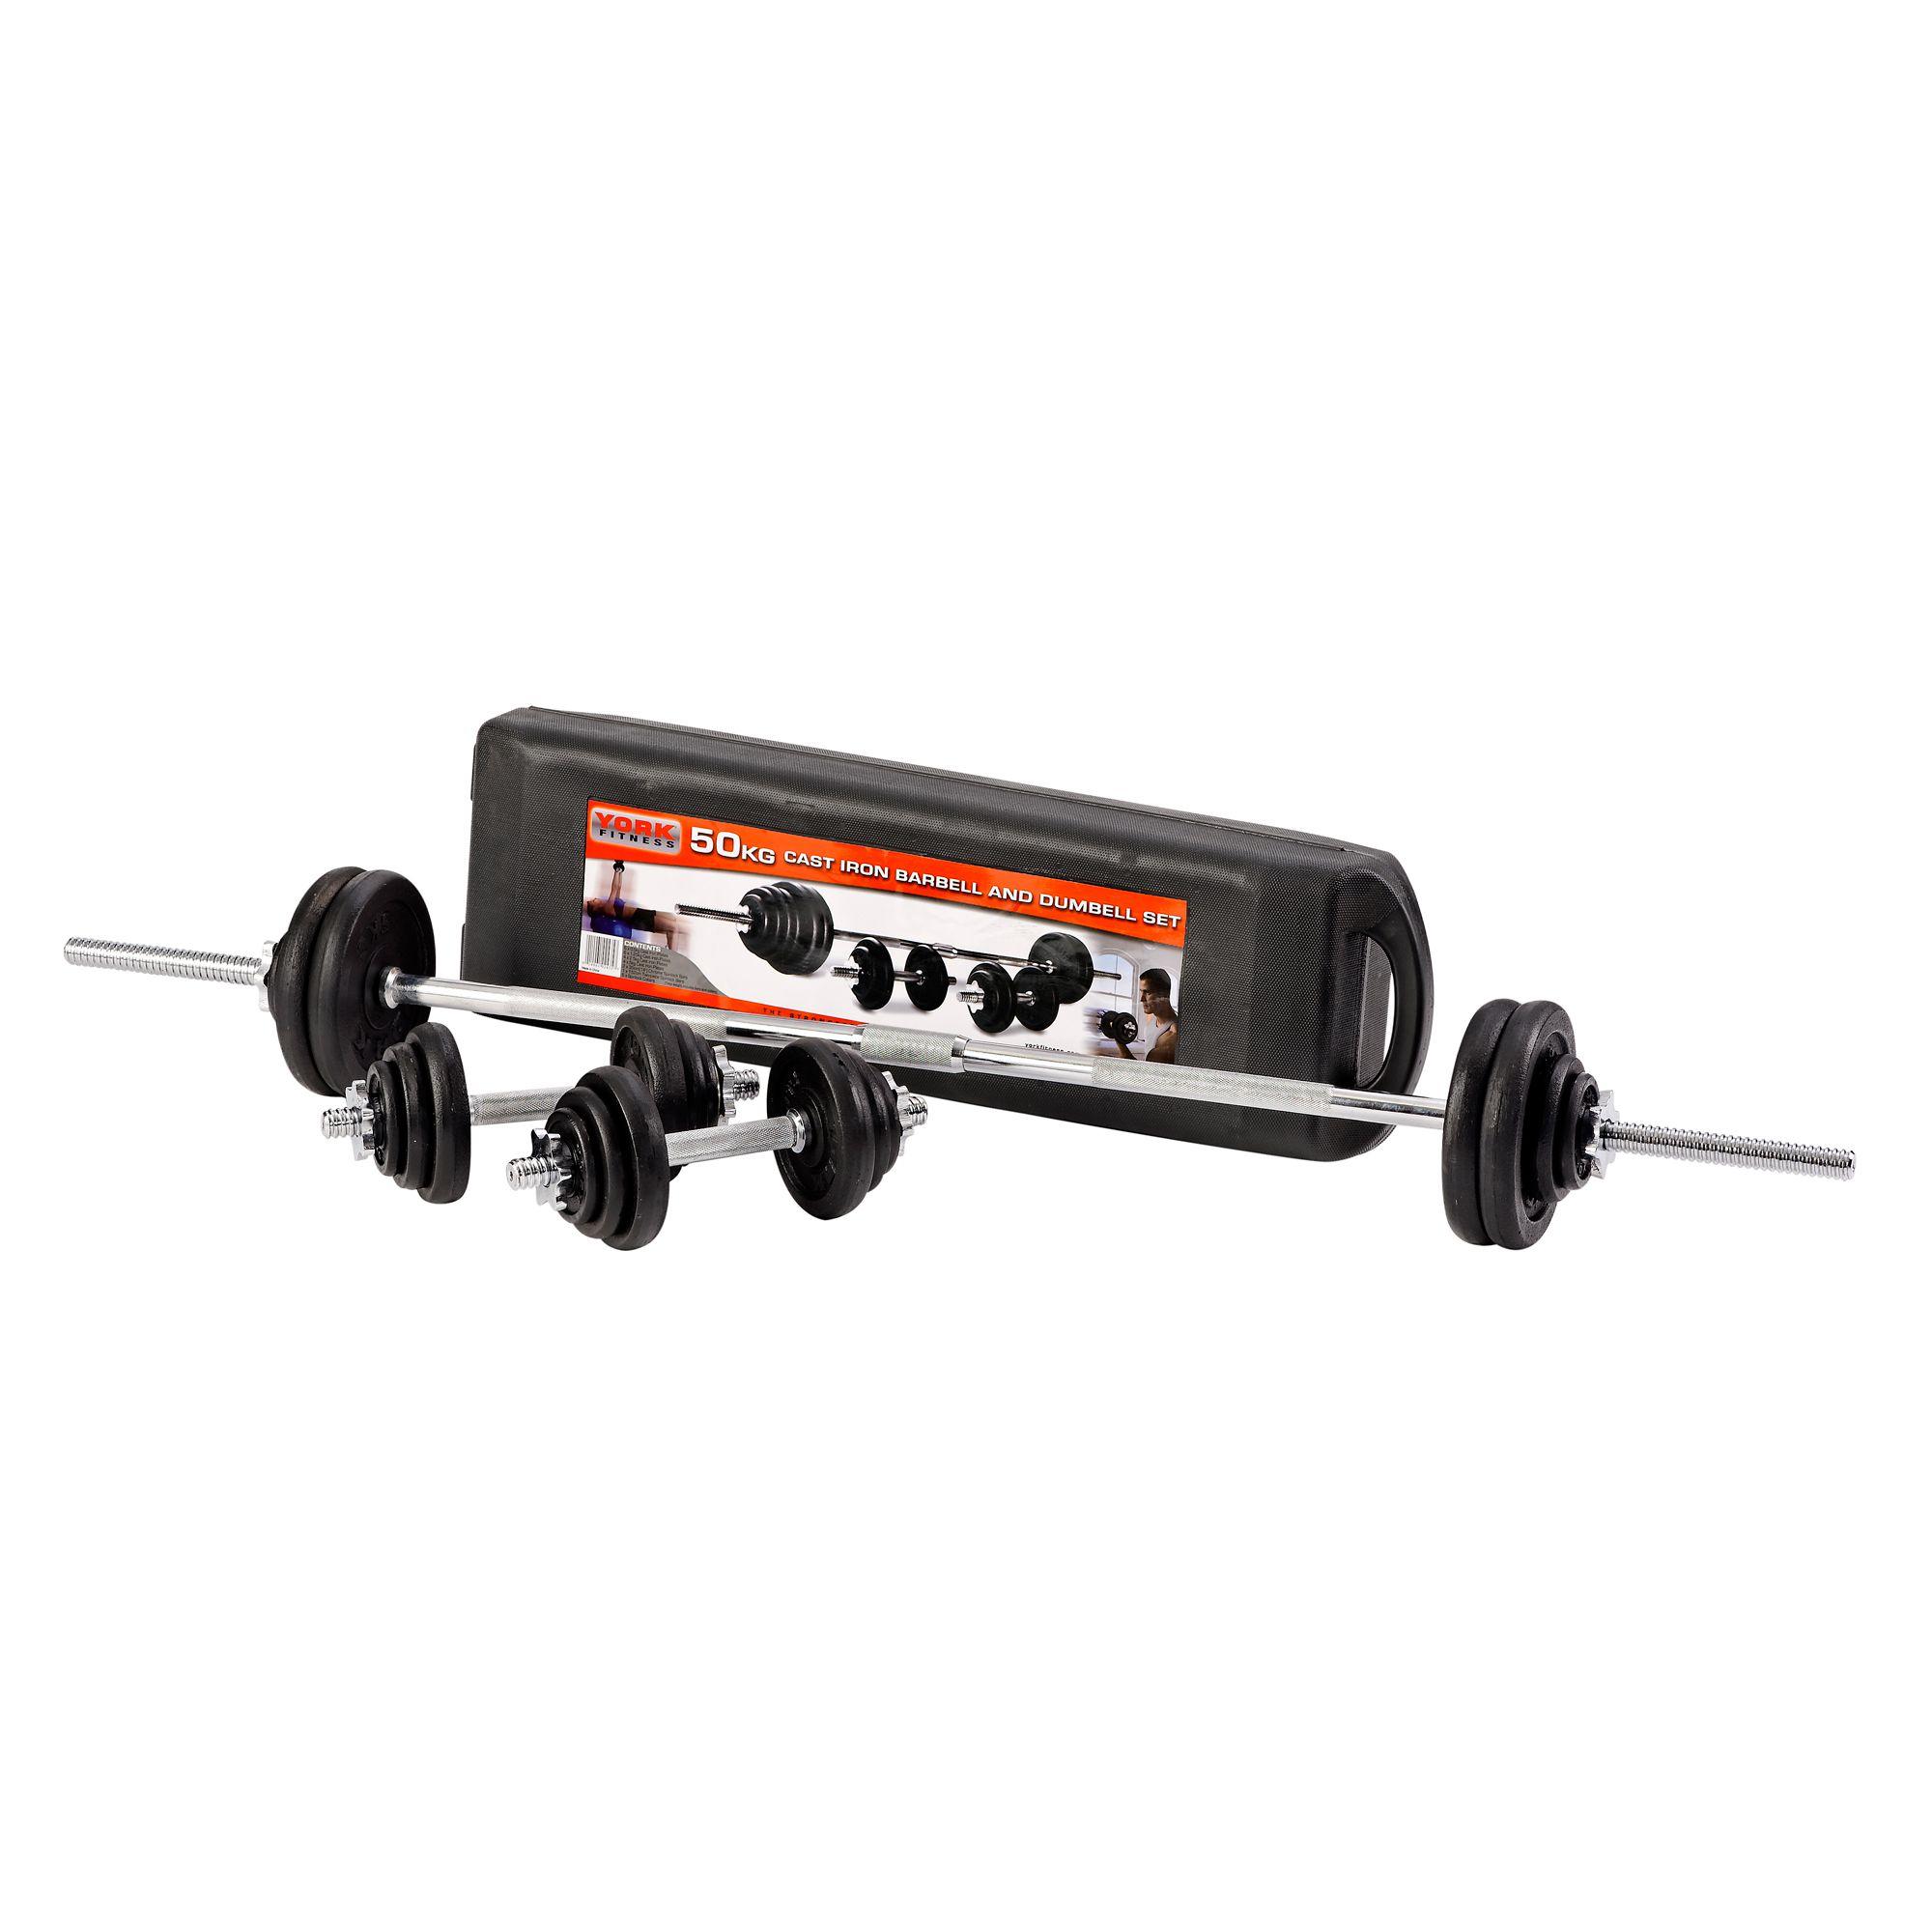 Dumbbell Set Mr Price Sport: York 50kg Black Cast Iron Barbell And Dumbbell Set In A